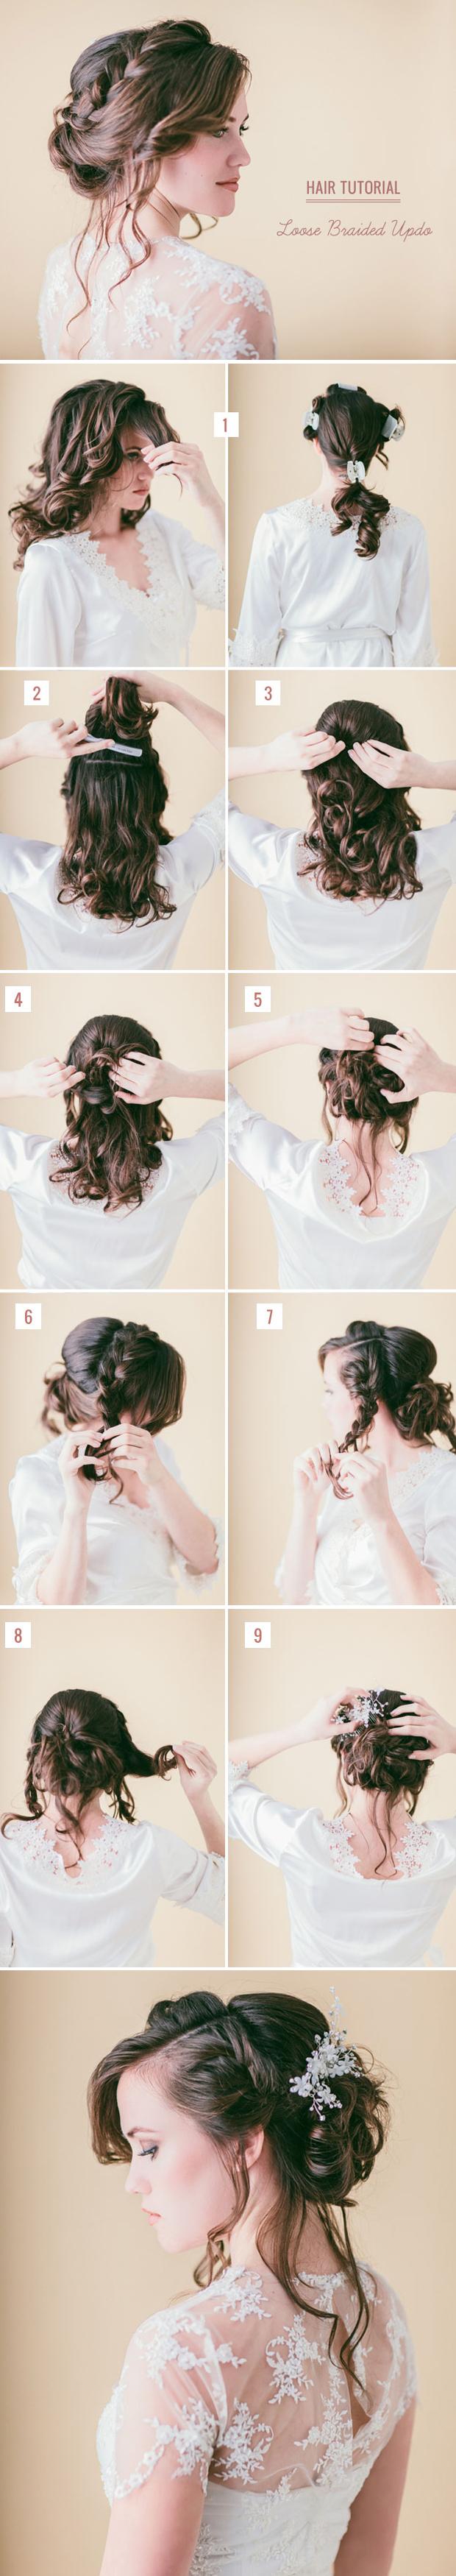 loose braided updo diy wedding hairstyles ideas